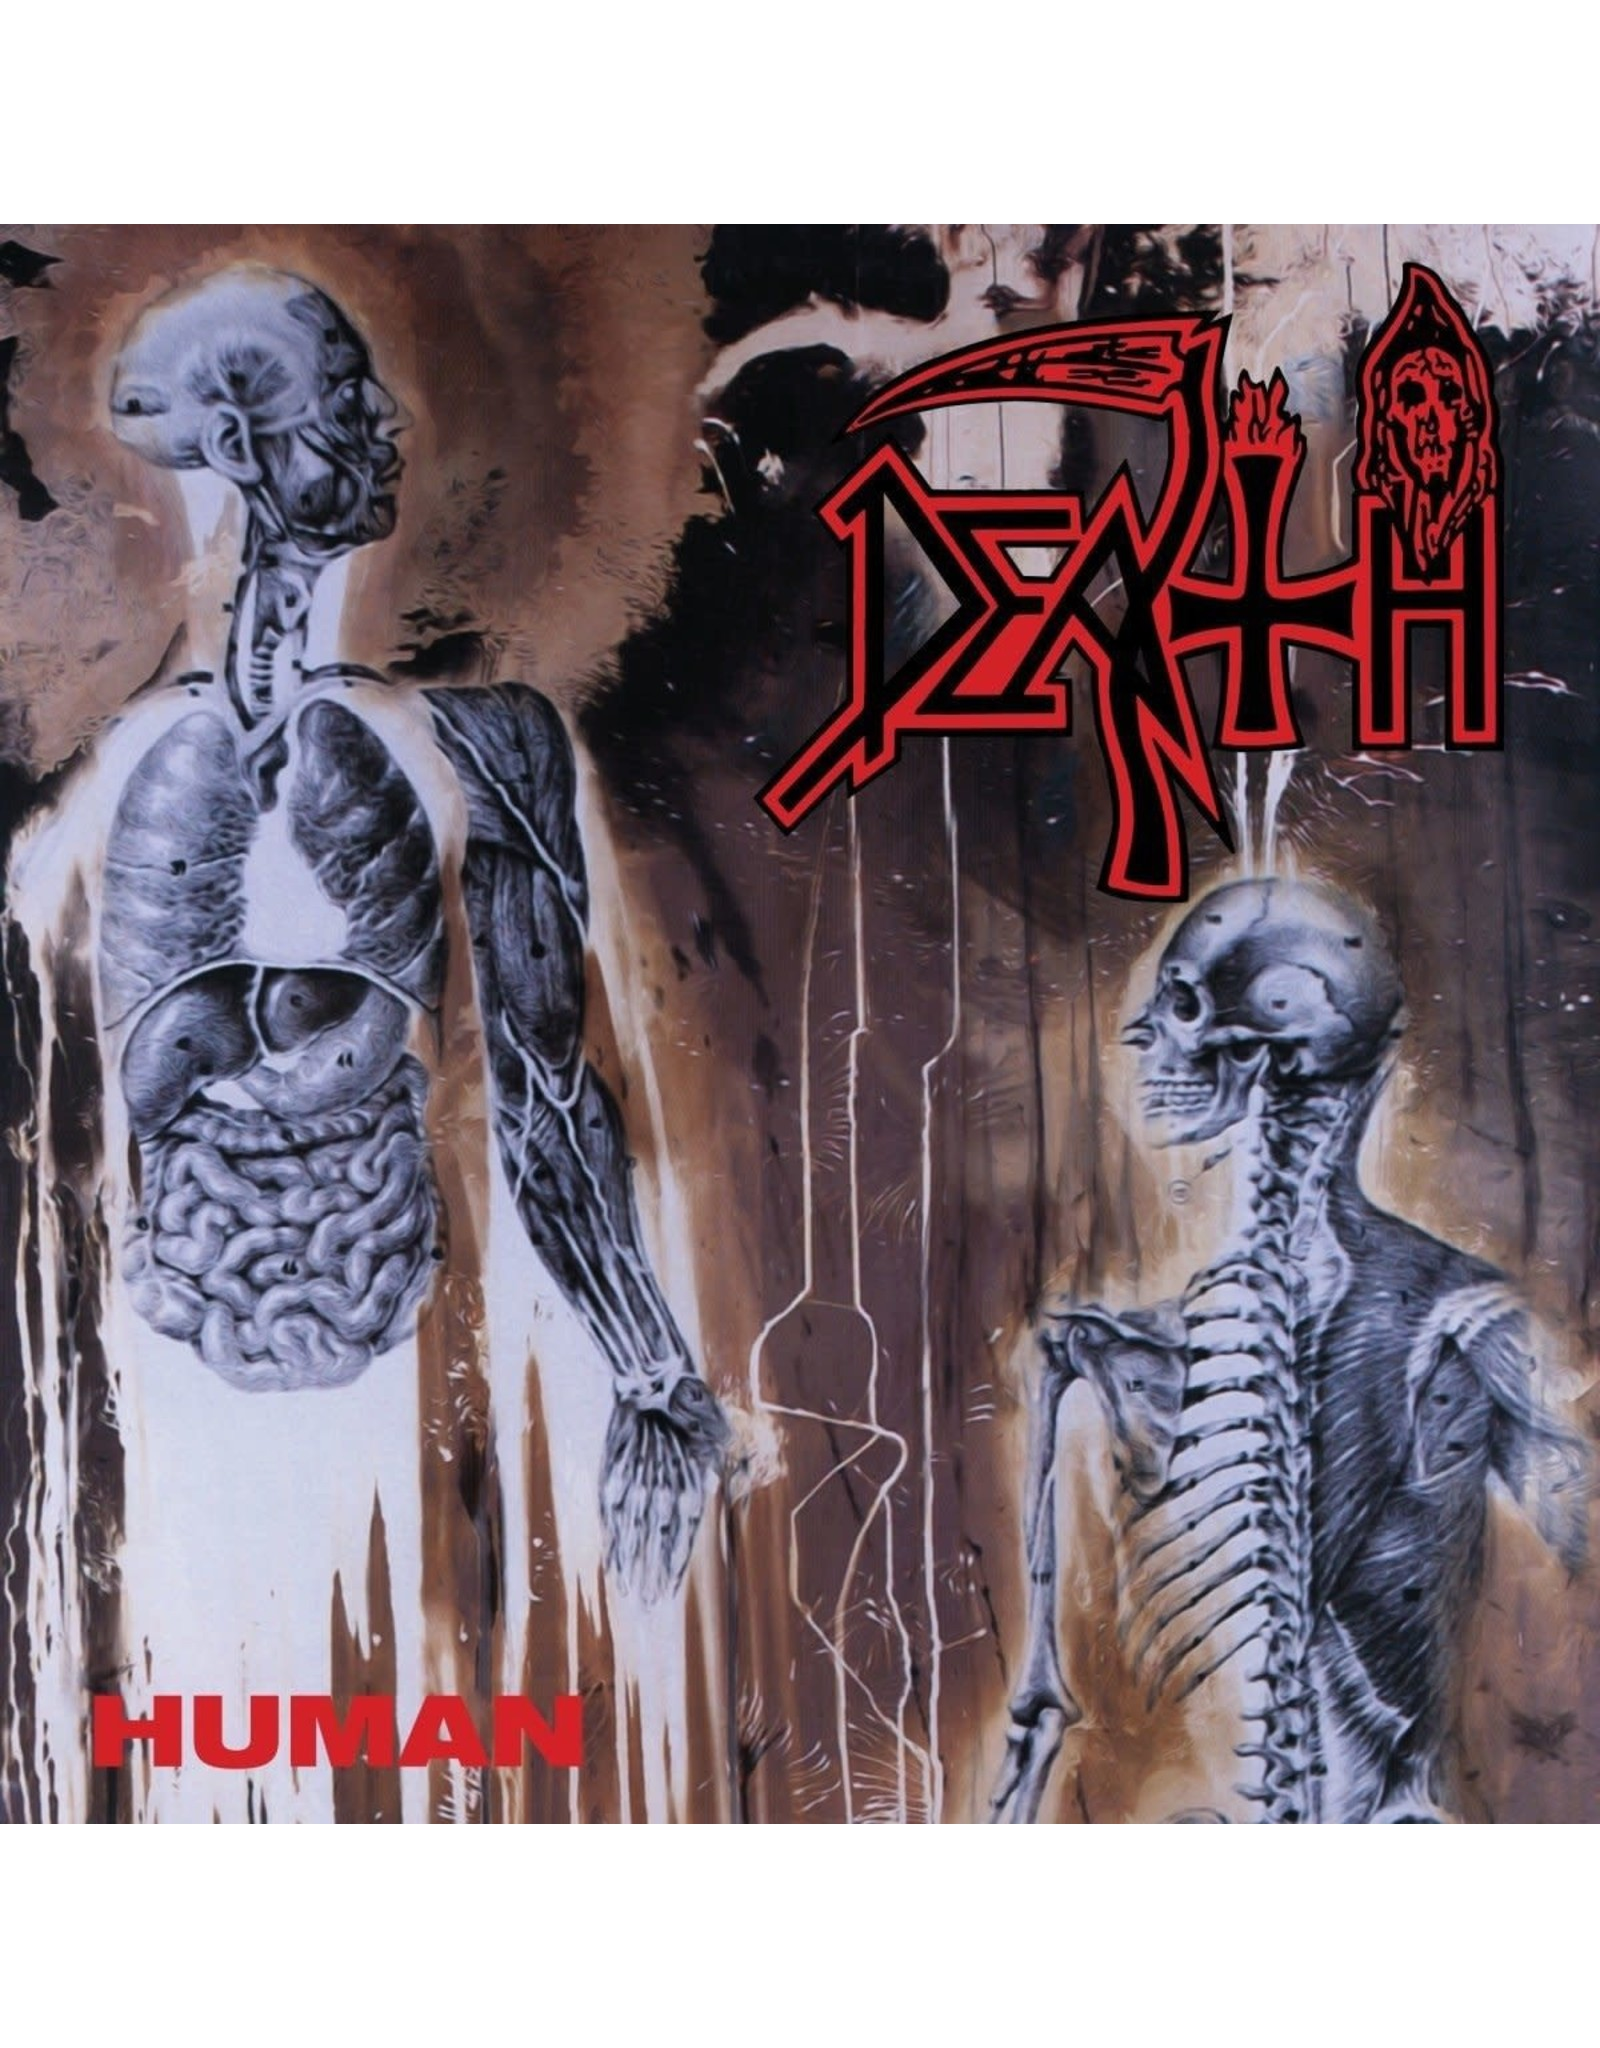 New Vinyl Death - Human (Custom Splatter) LP